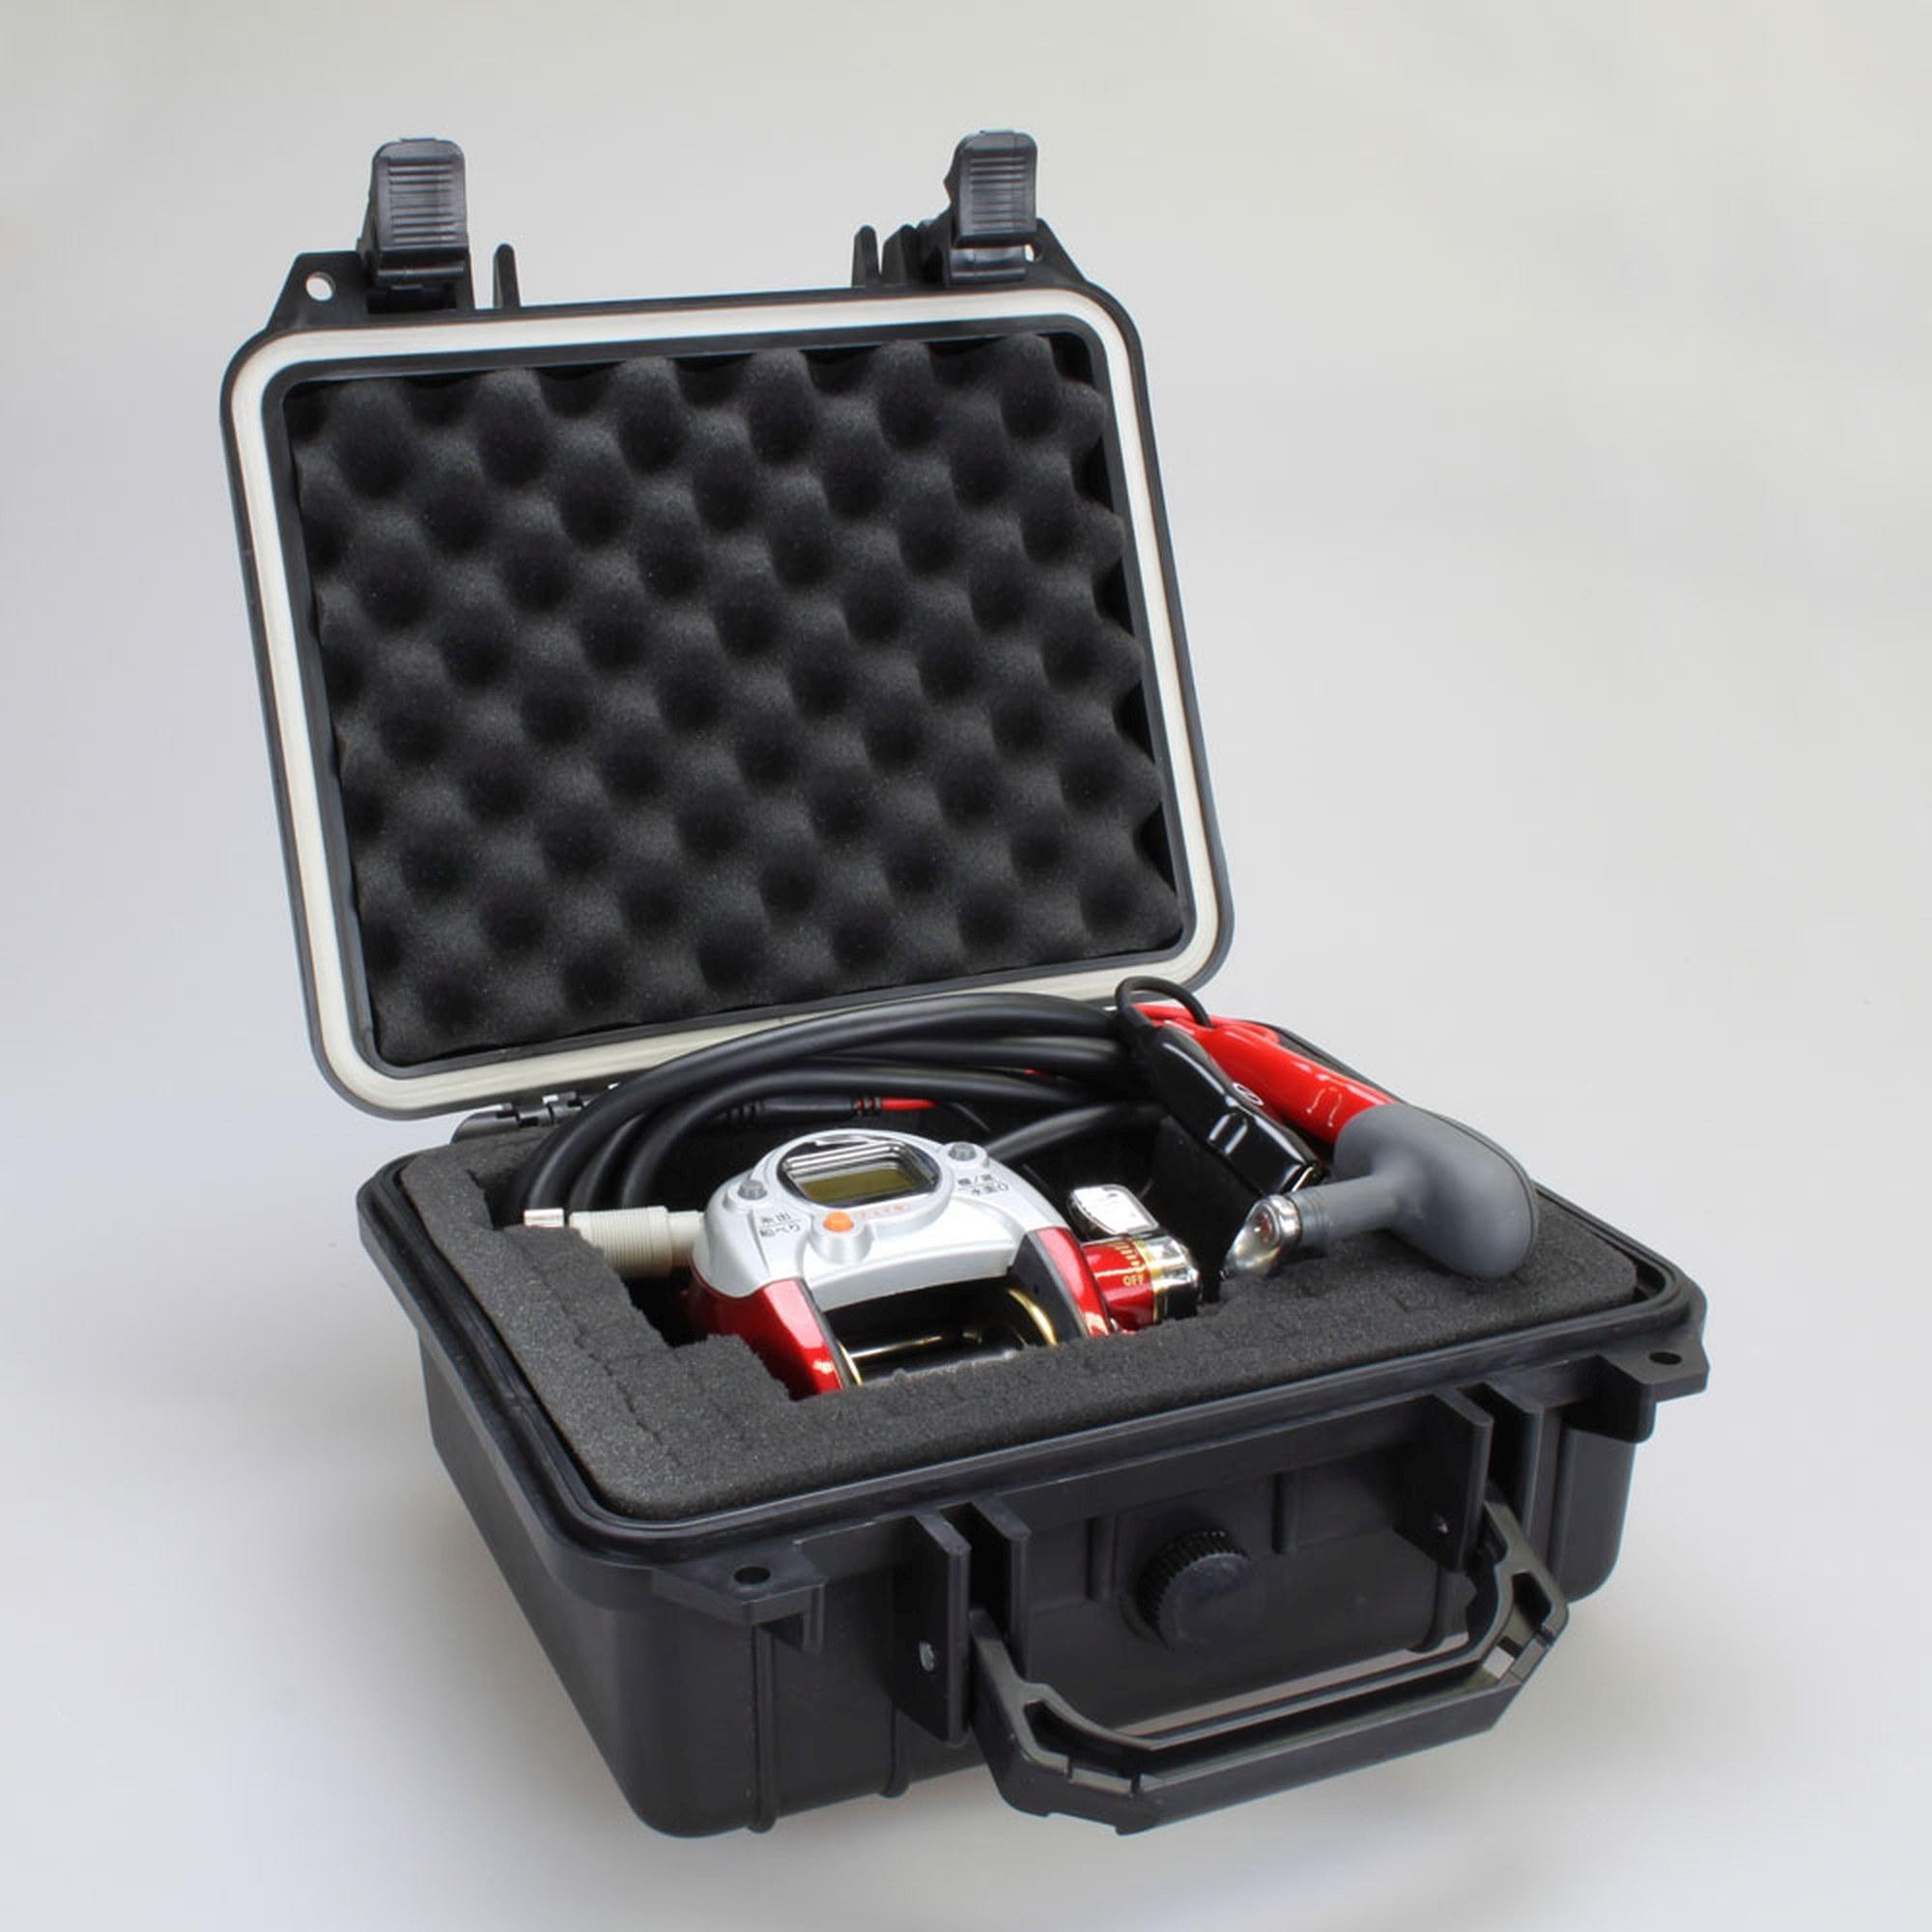 Купить с кэшбэком Tool case toolbox suitcase Impact resistant sealed waterproof plastic case equipment box camera case Meter box with pre-cut foam